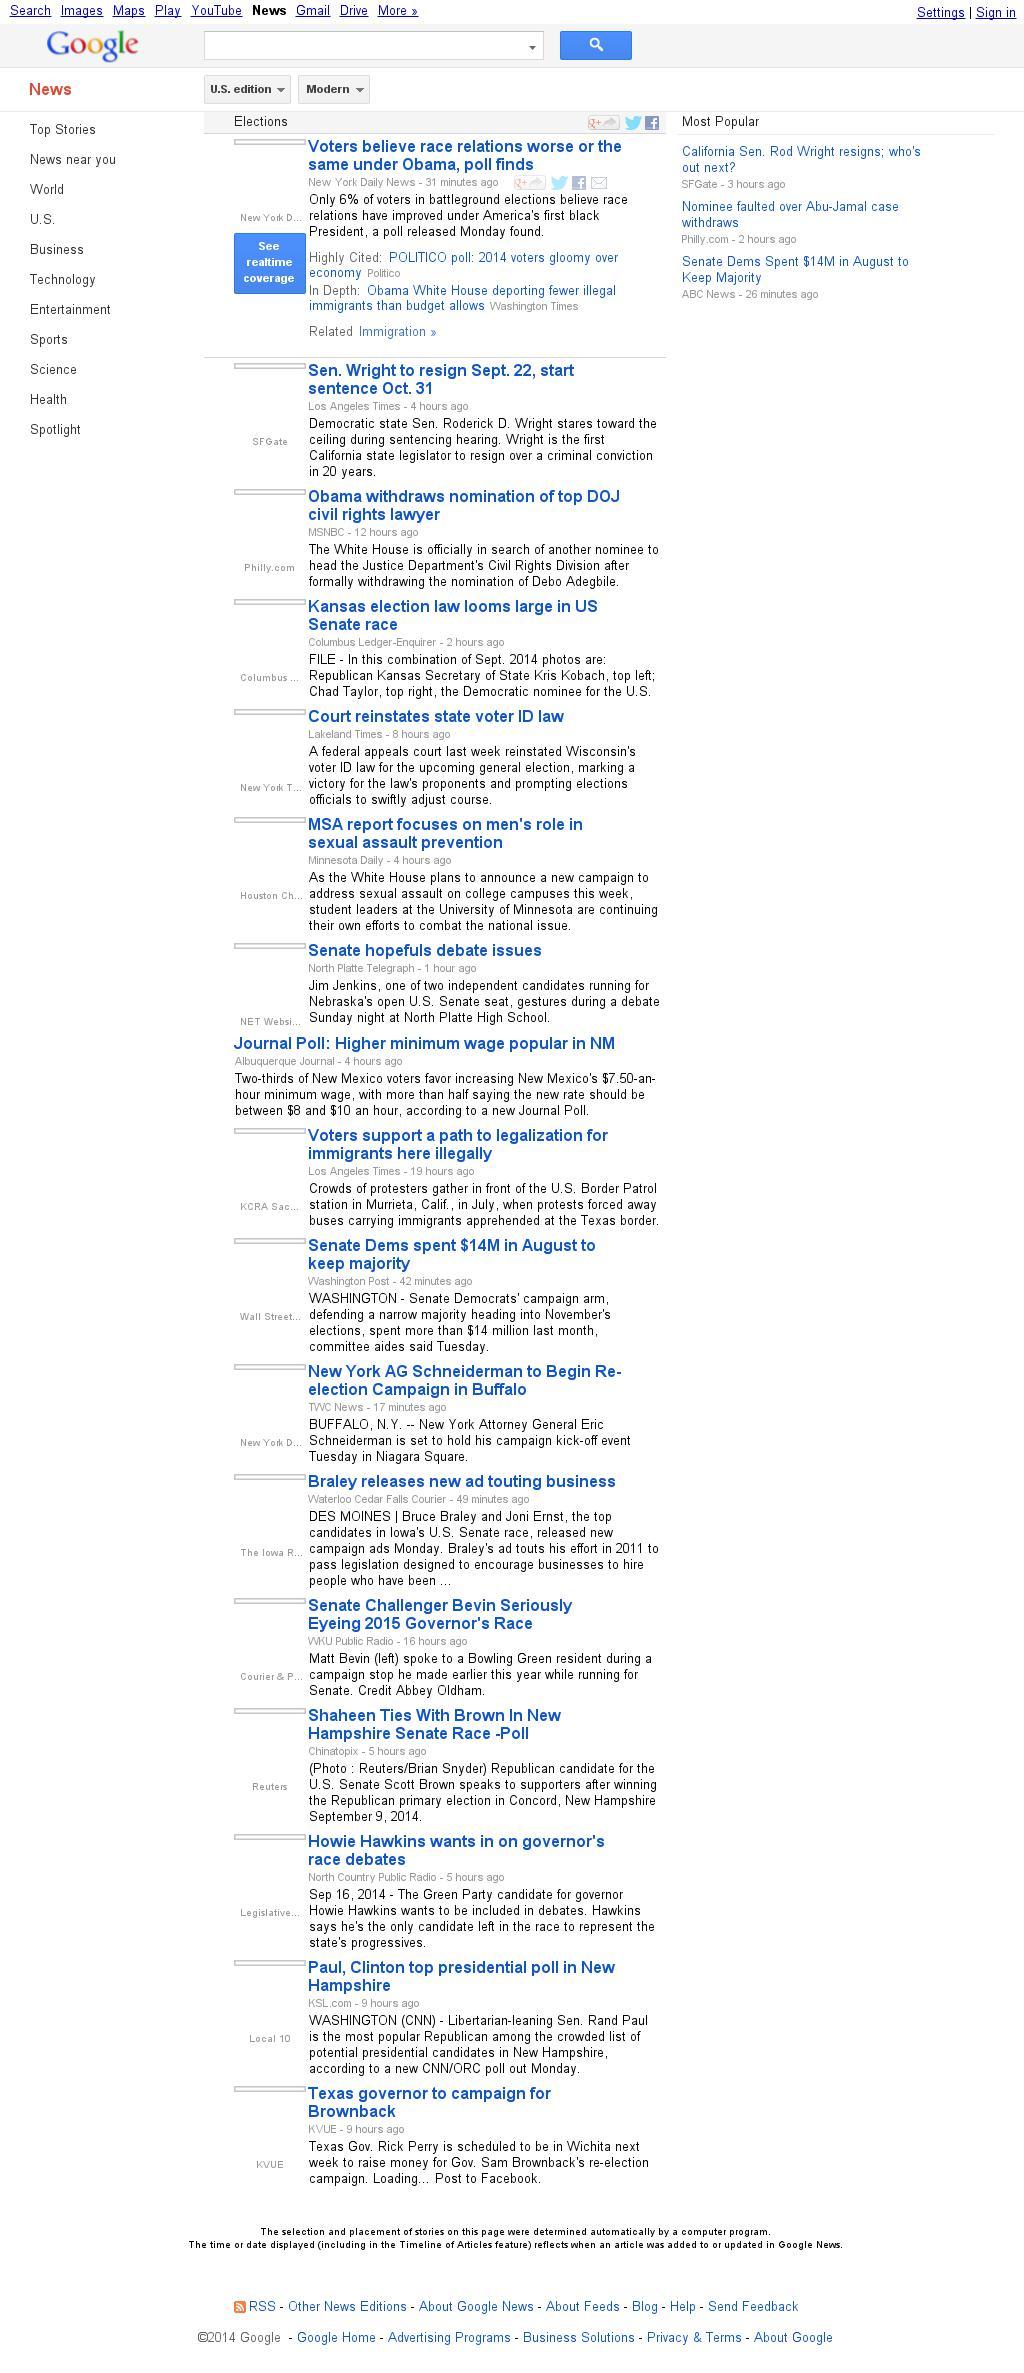 Google News: Elections at Tuesday Sept. 16, 2014, 10:05 a.m. UTC